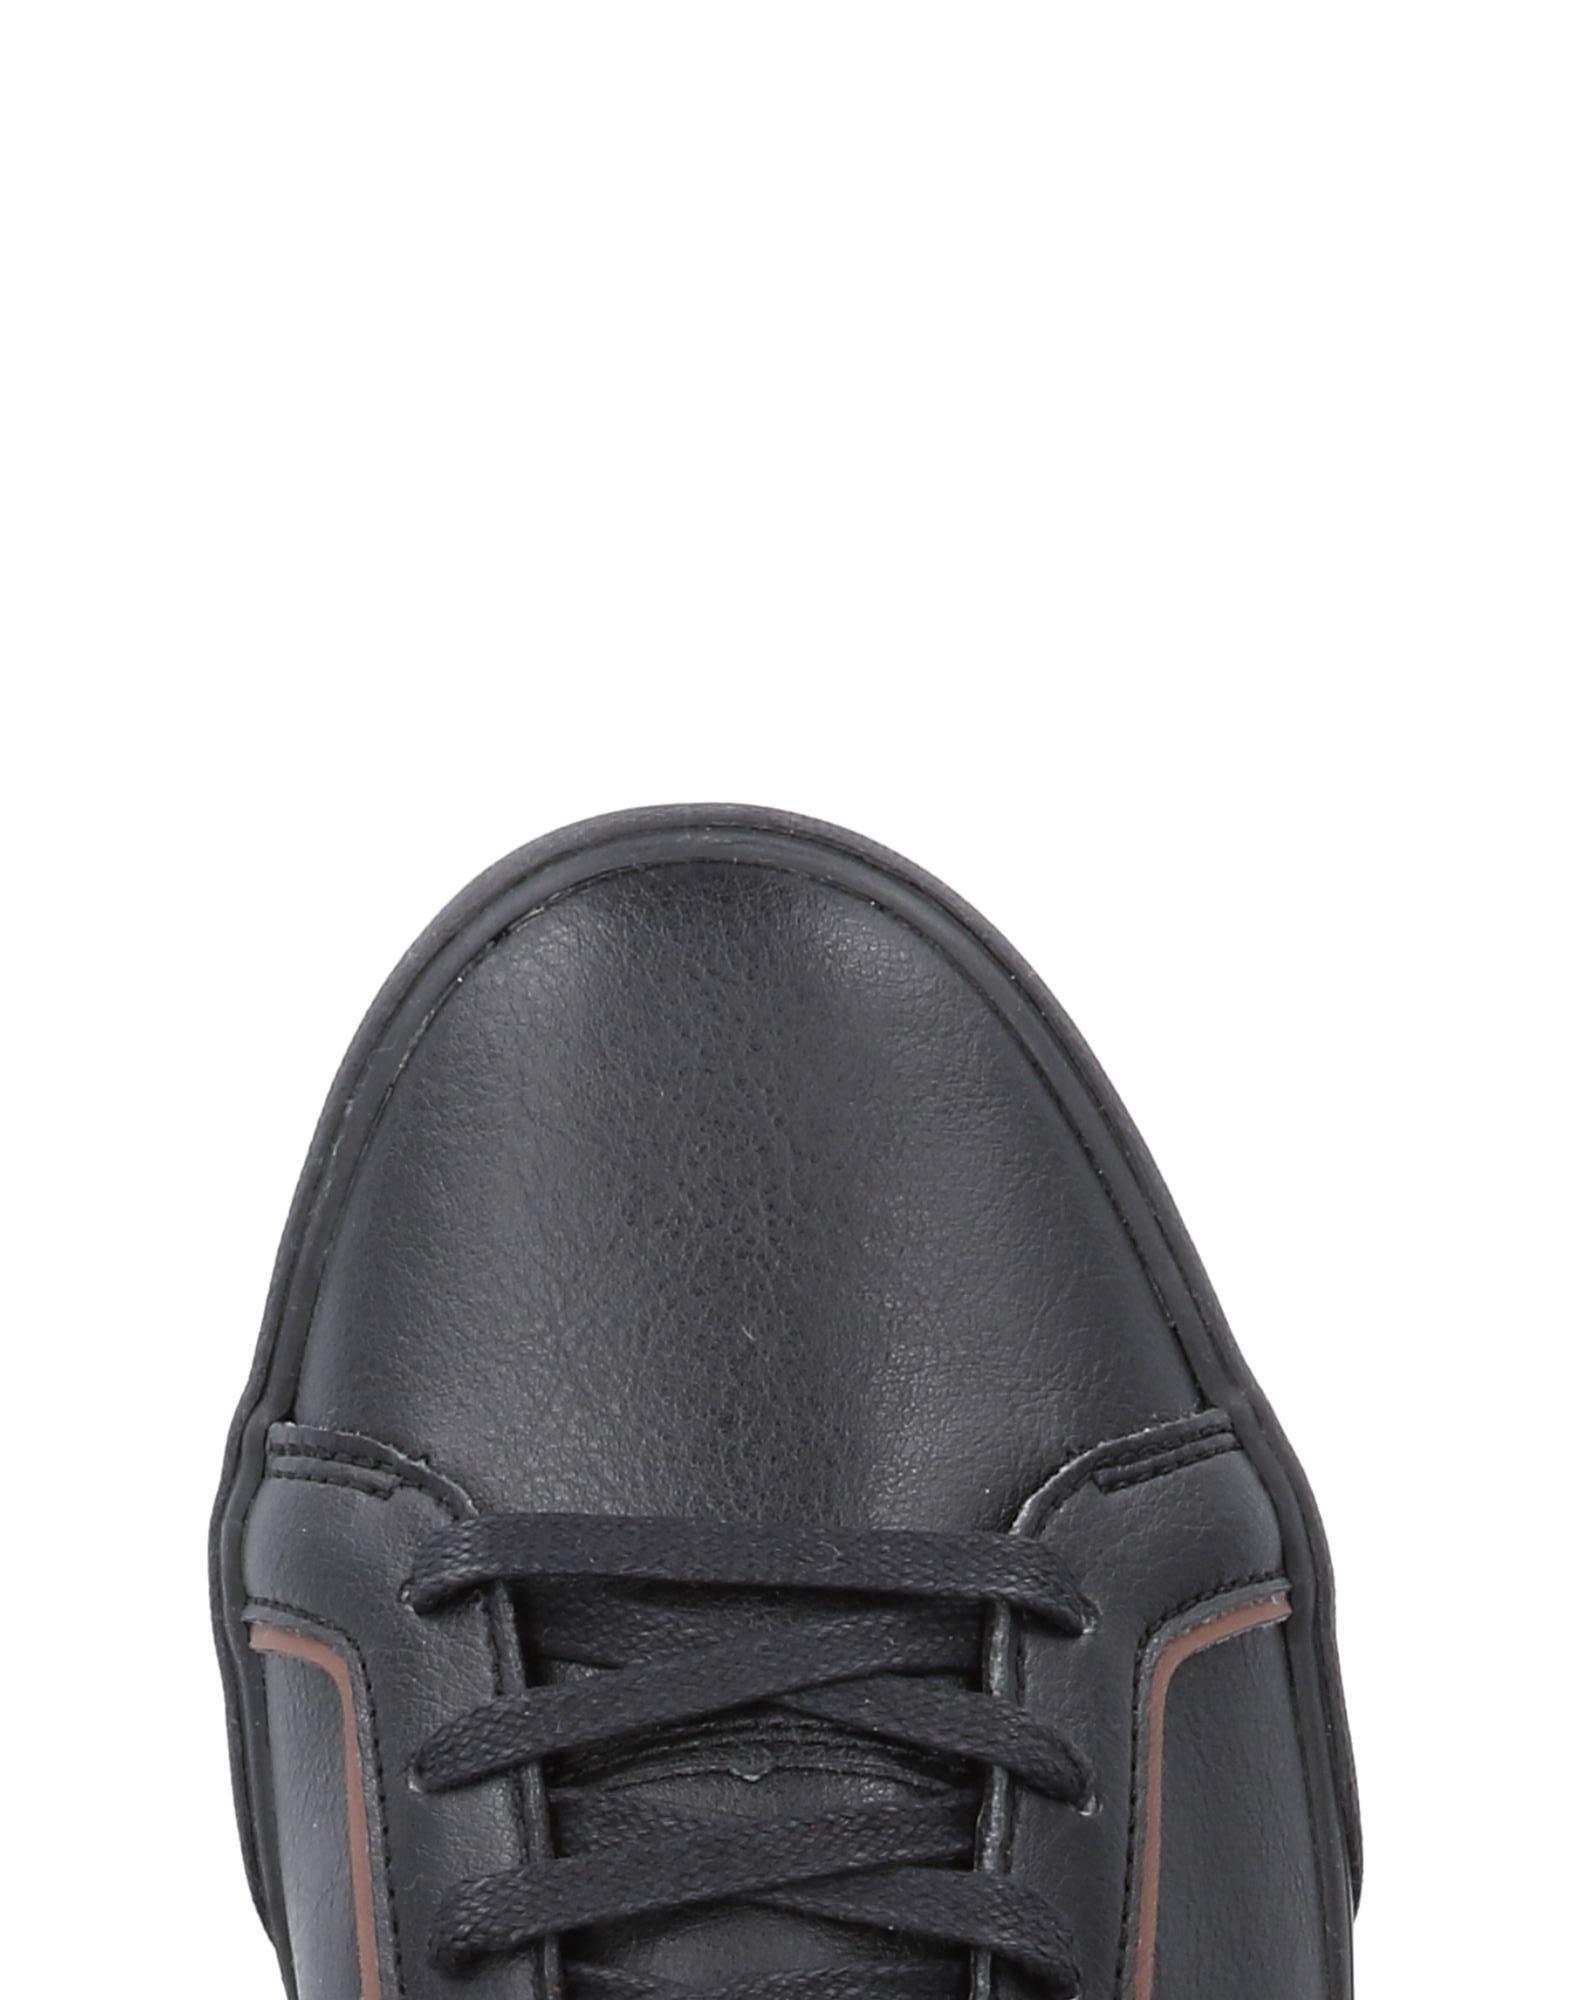 Rabatt echte Schuhe Le Coq 11497476CA Sportif Sneakers Herren  11497476CA Coq 48a0d6